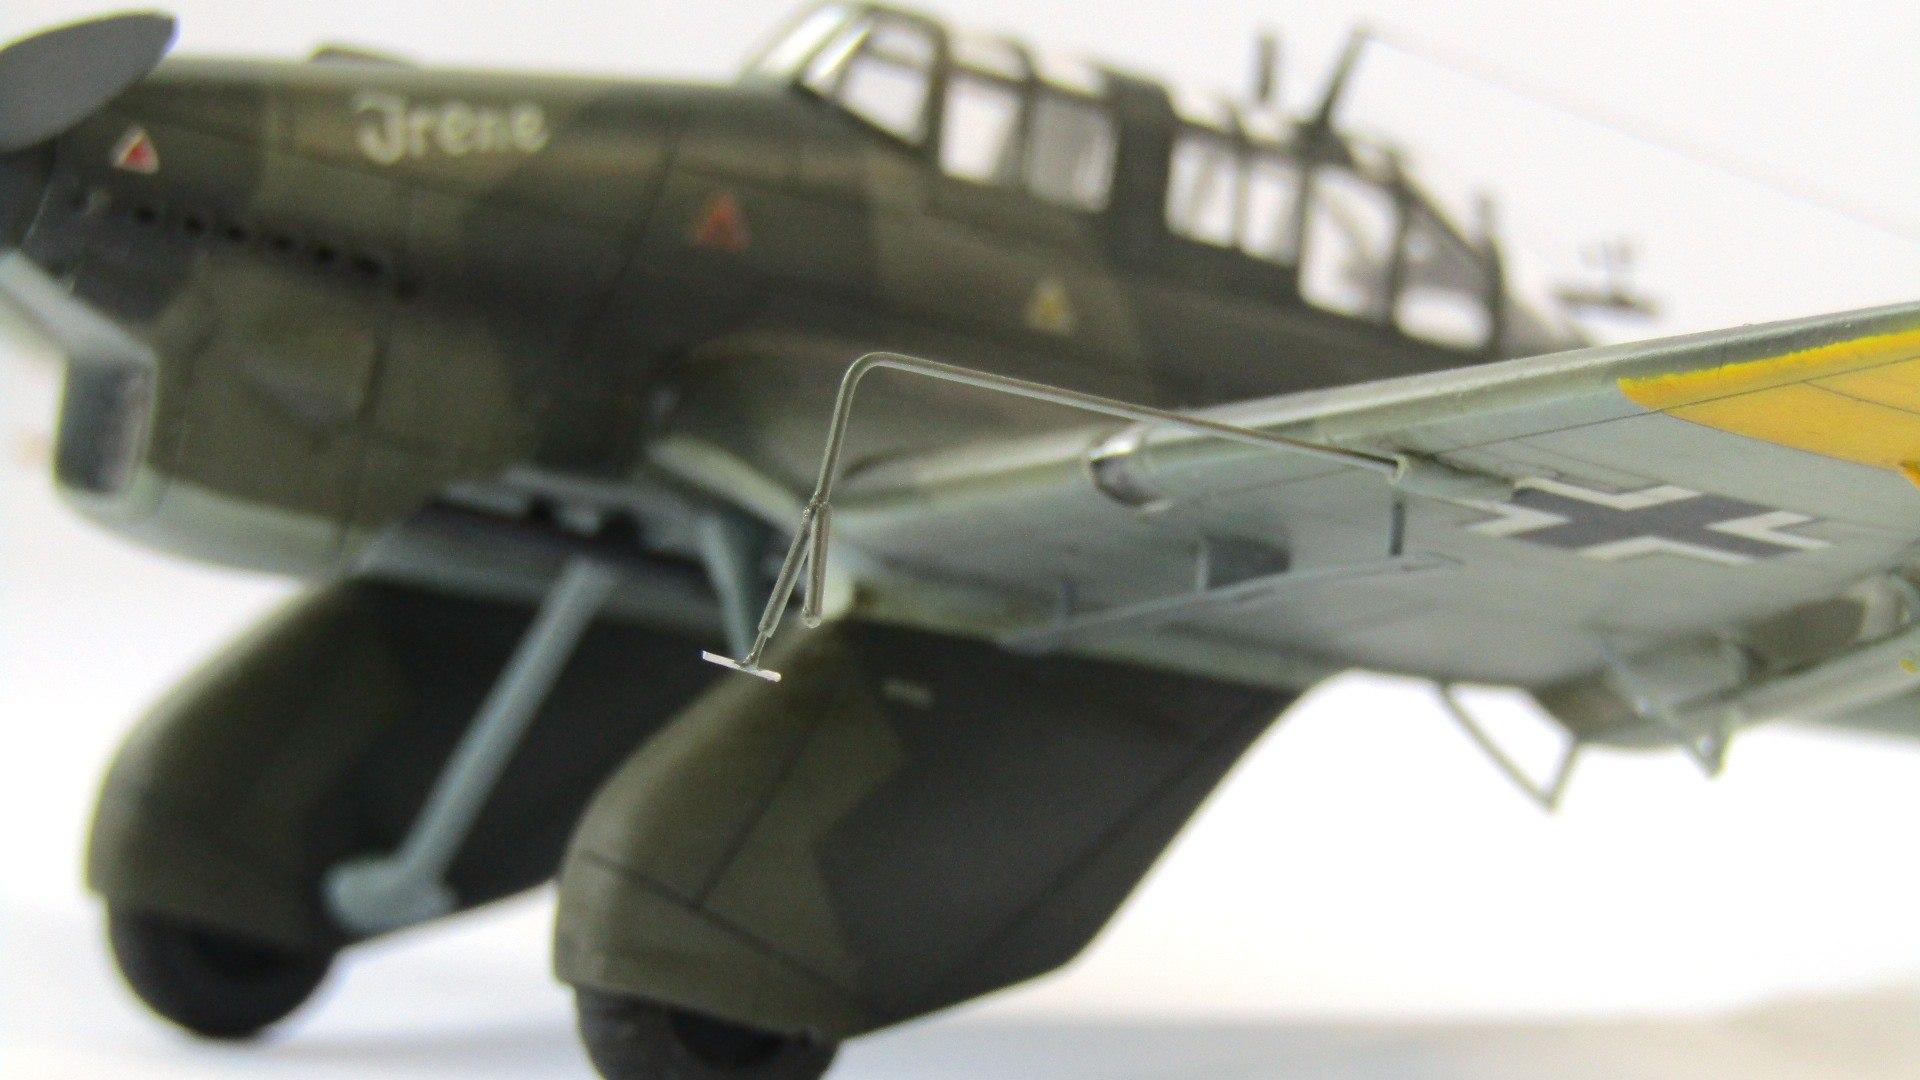 Ju-87A 1/72 (Special Hobby) IbrNjb9LMRQ